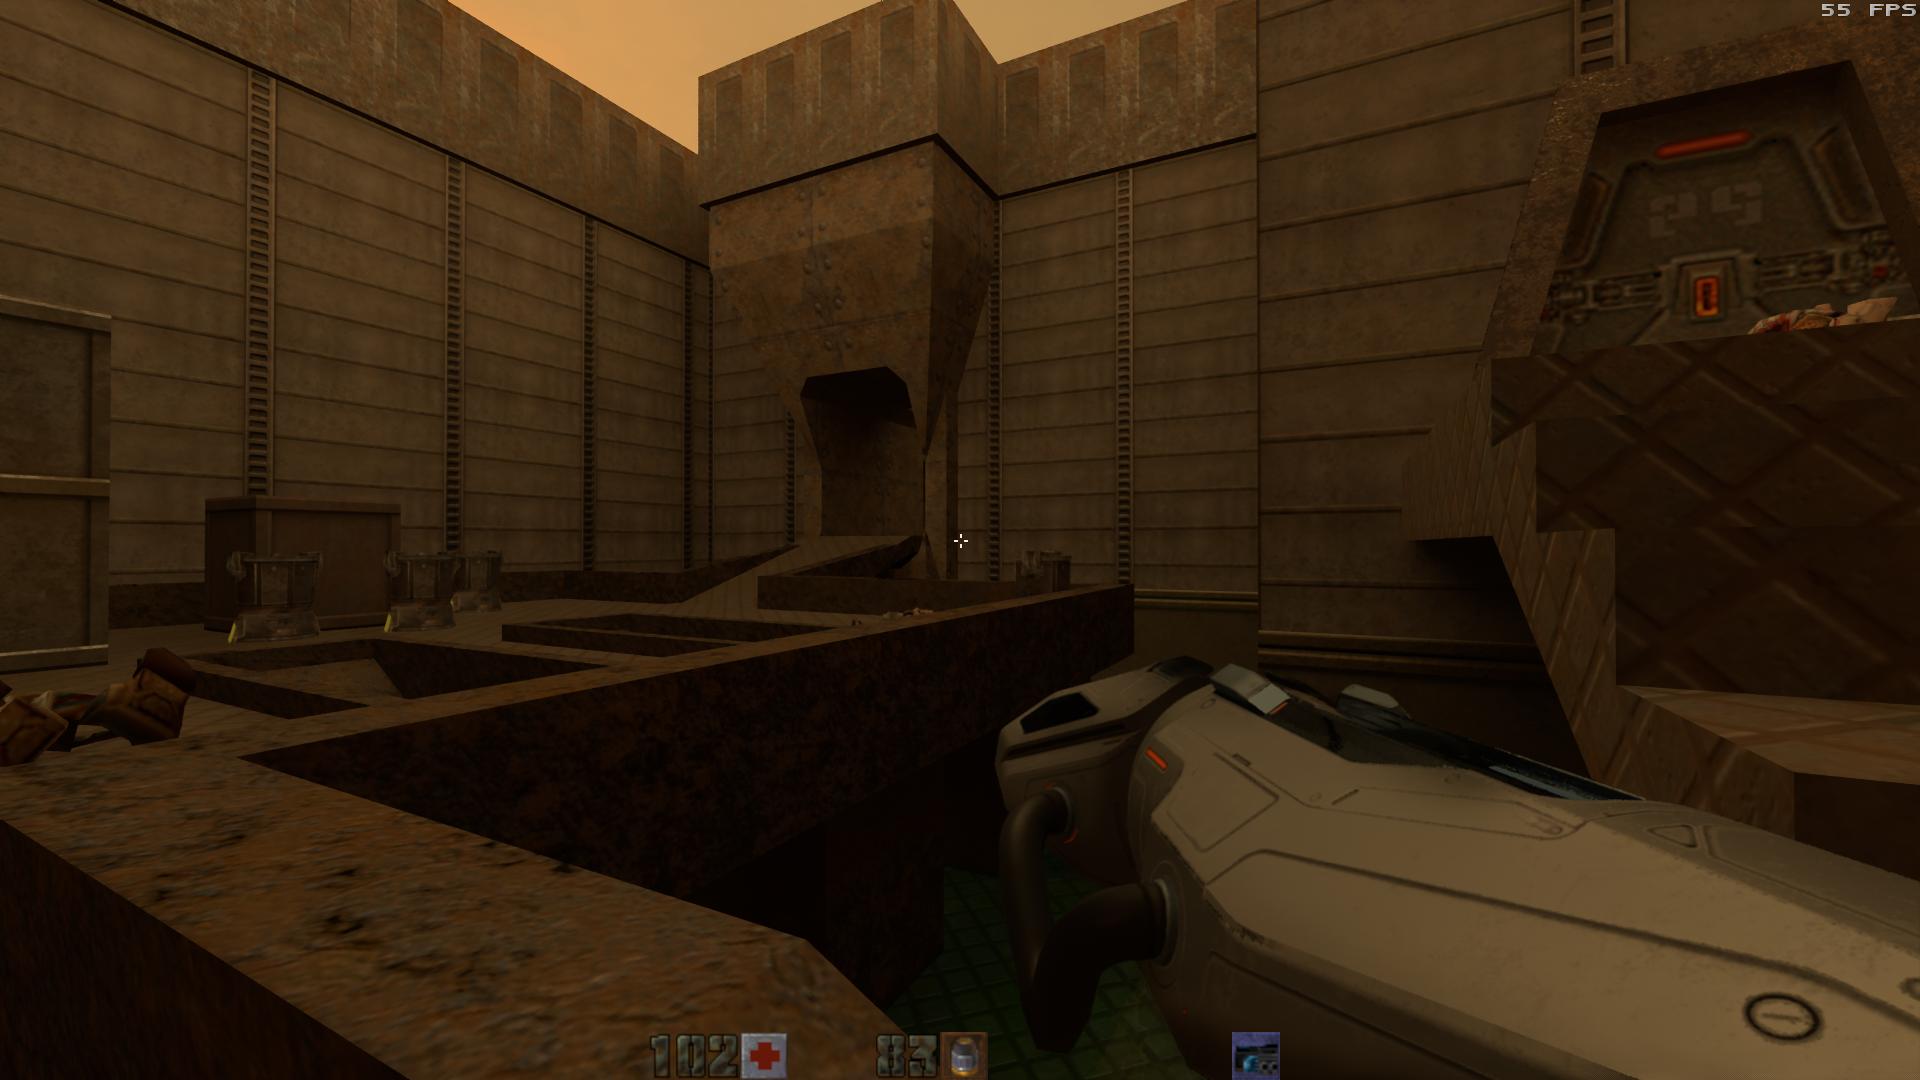 Quake 2 RTX Remaster Screenshot 2019.11.26 - 16.07.47.09.png